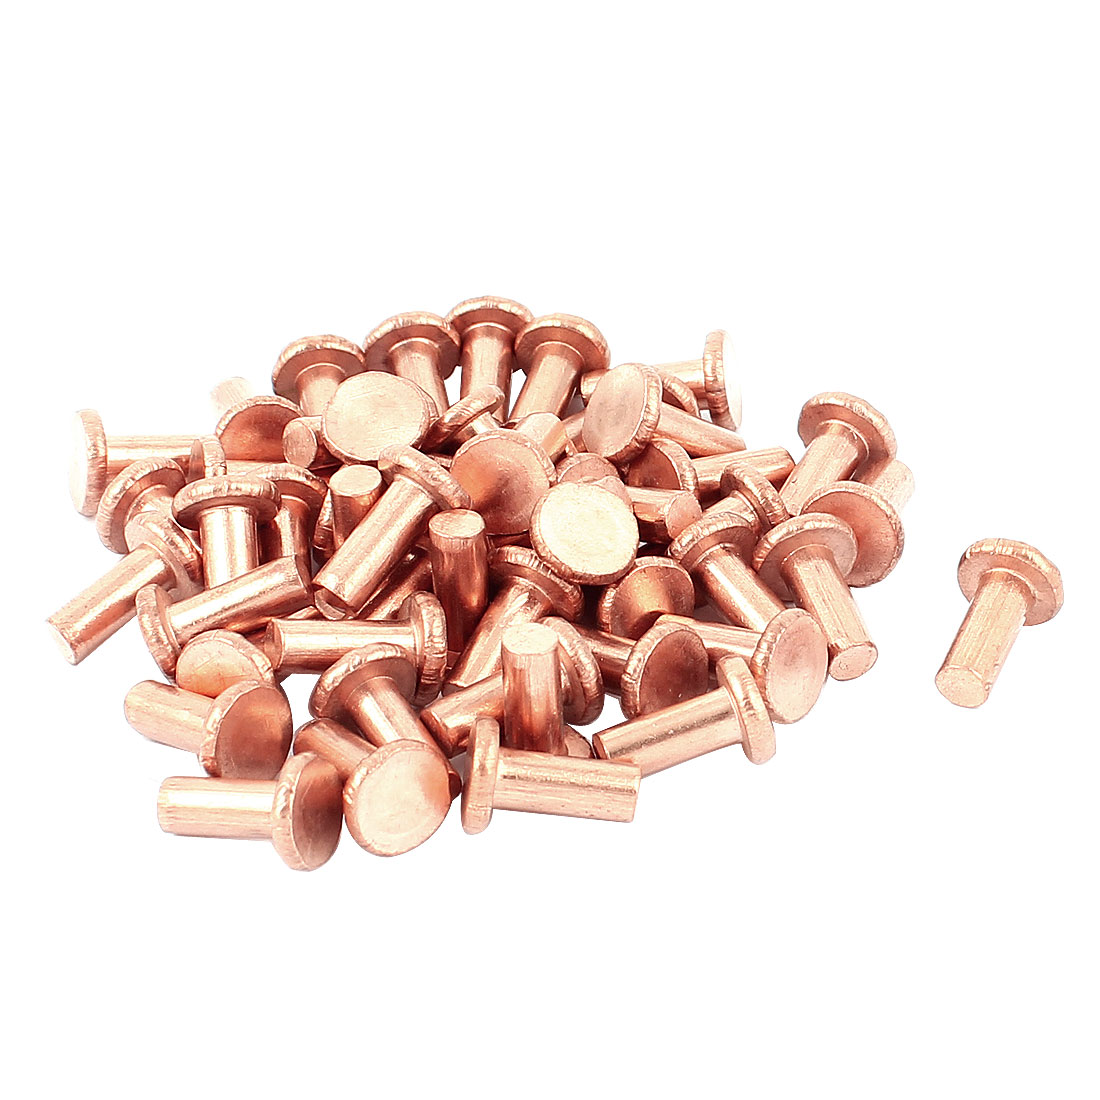 "50 Pcs 13/64"" Diameter 15/32"" Long Shank Flat Head Bolts Copper Solid Rivets Fasteners"